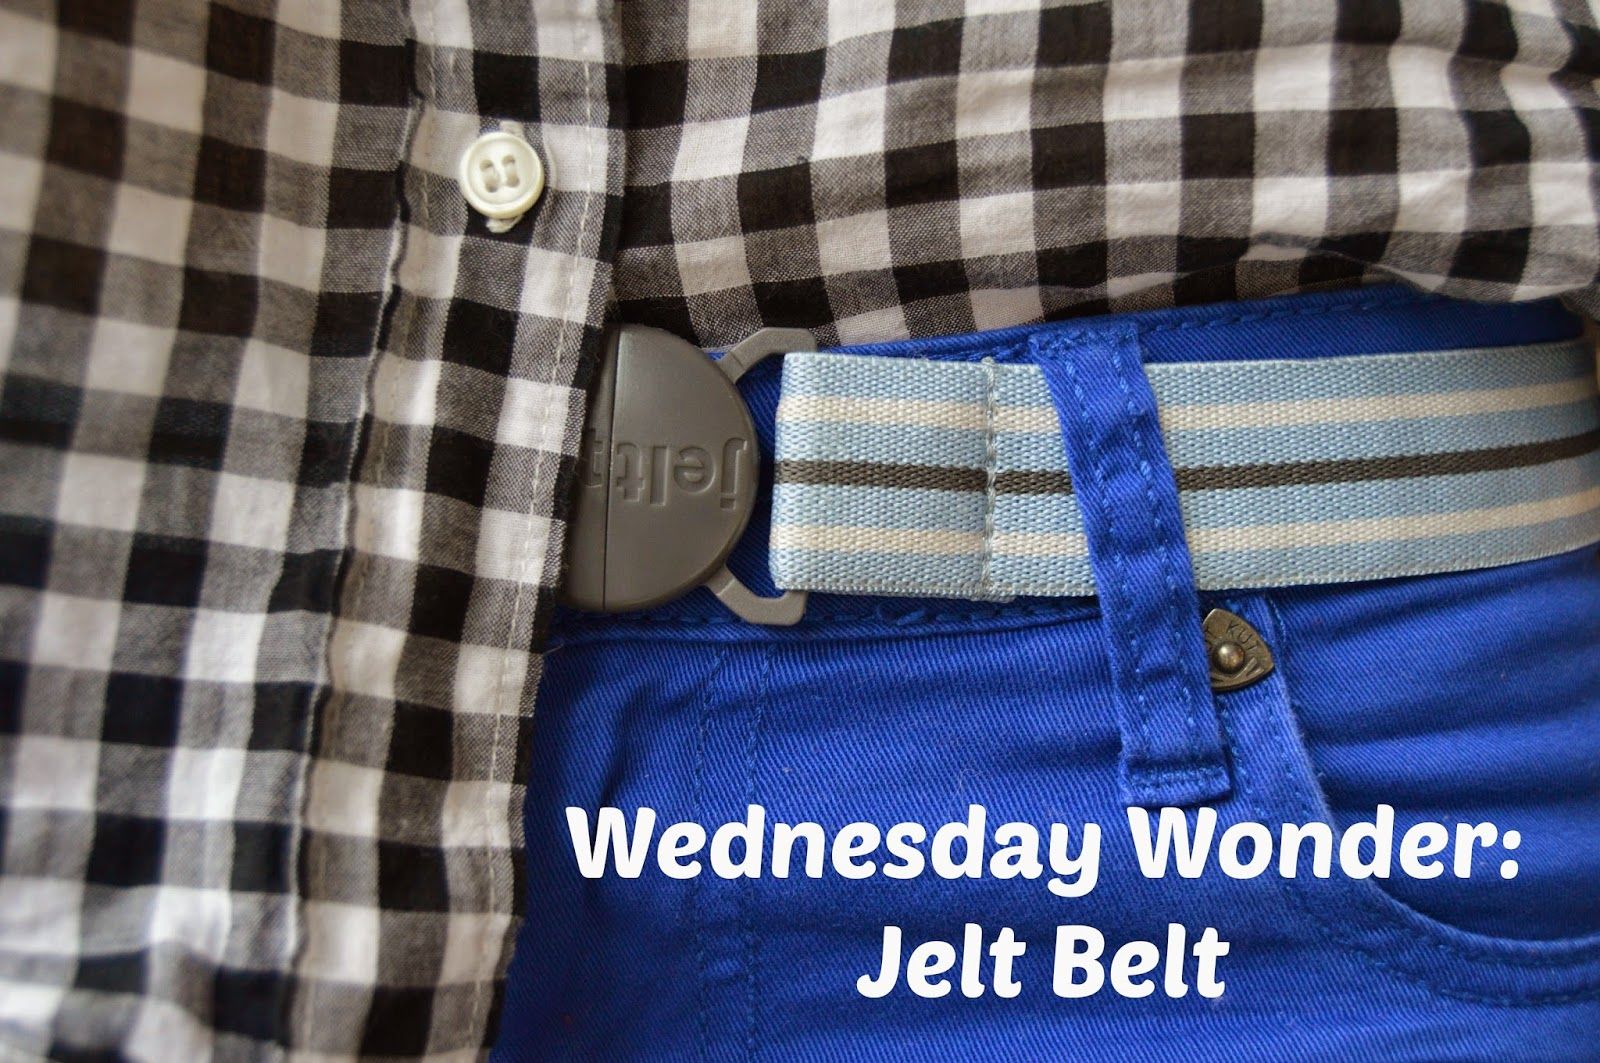 c87a6ff8857b8 Wednesday Wonder  Jelt Belt